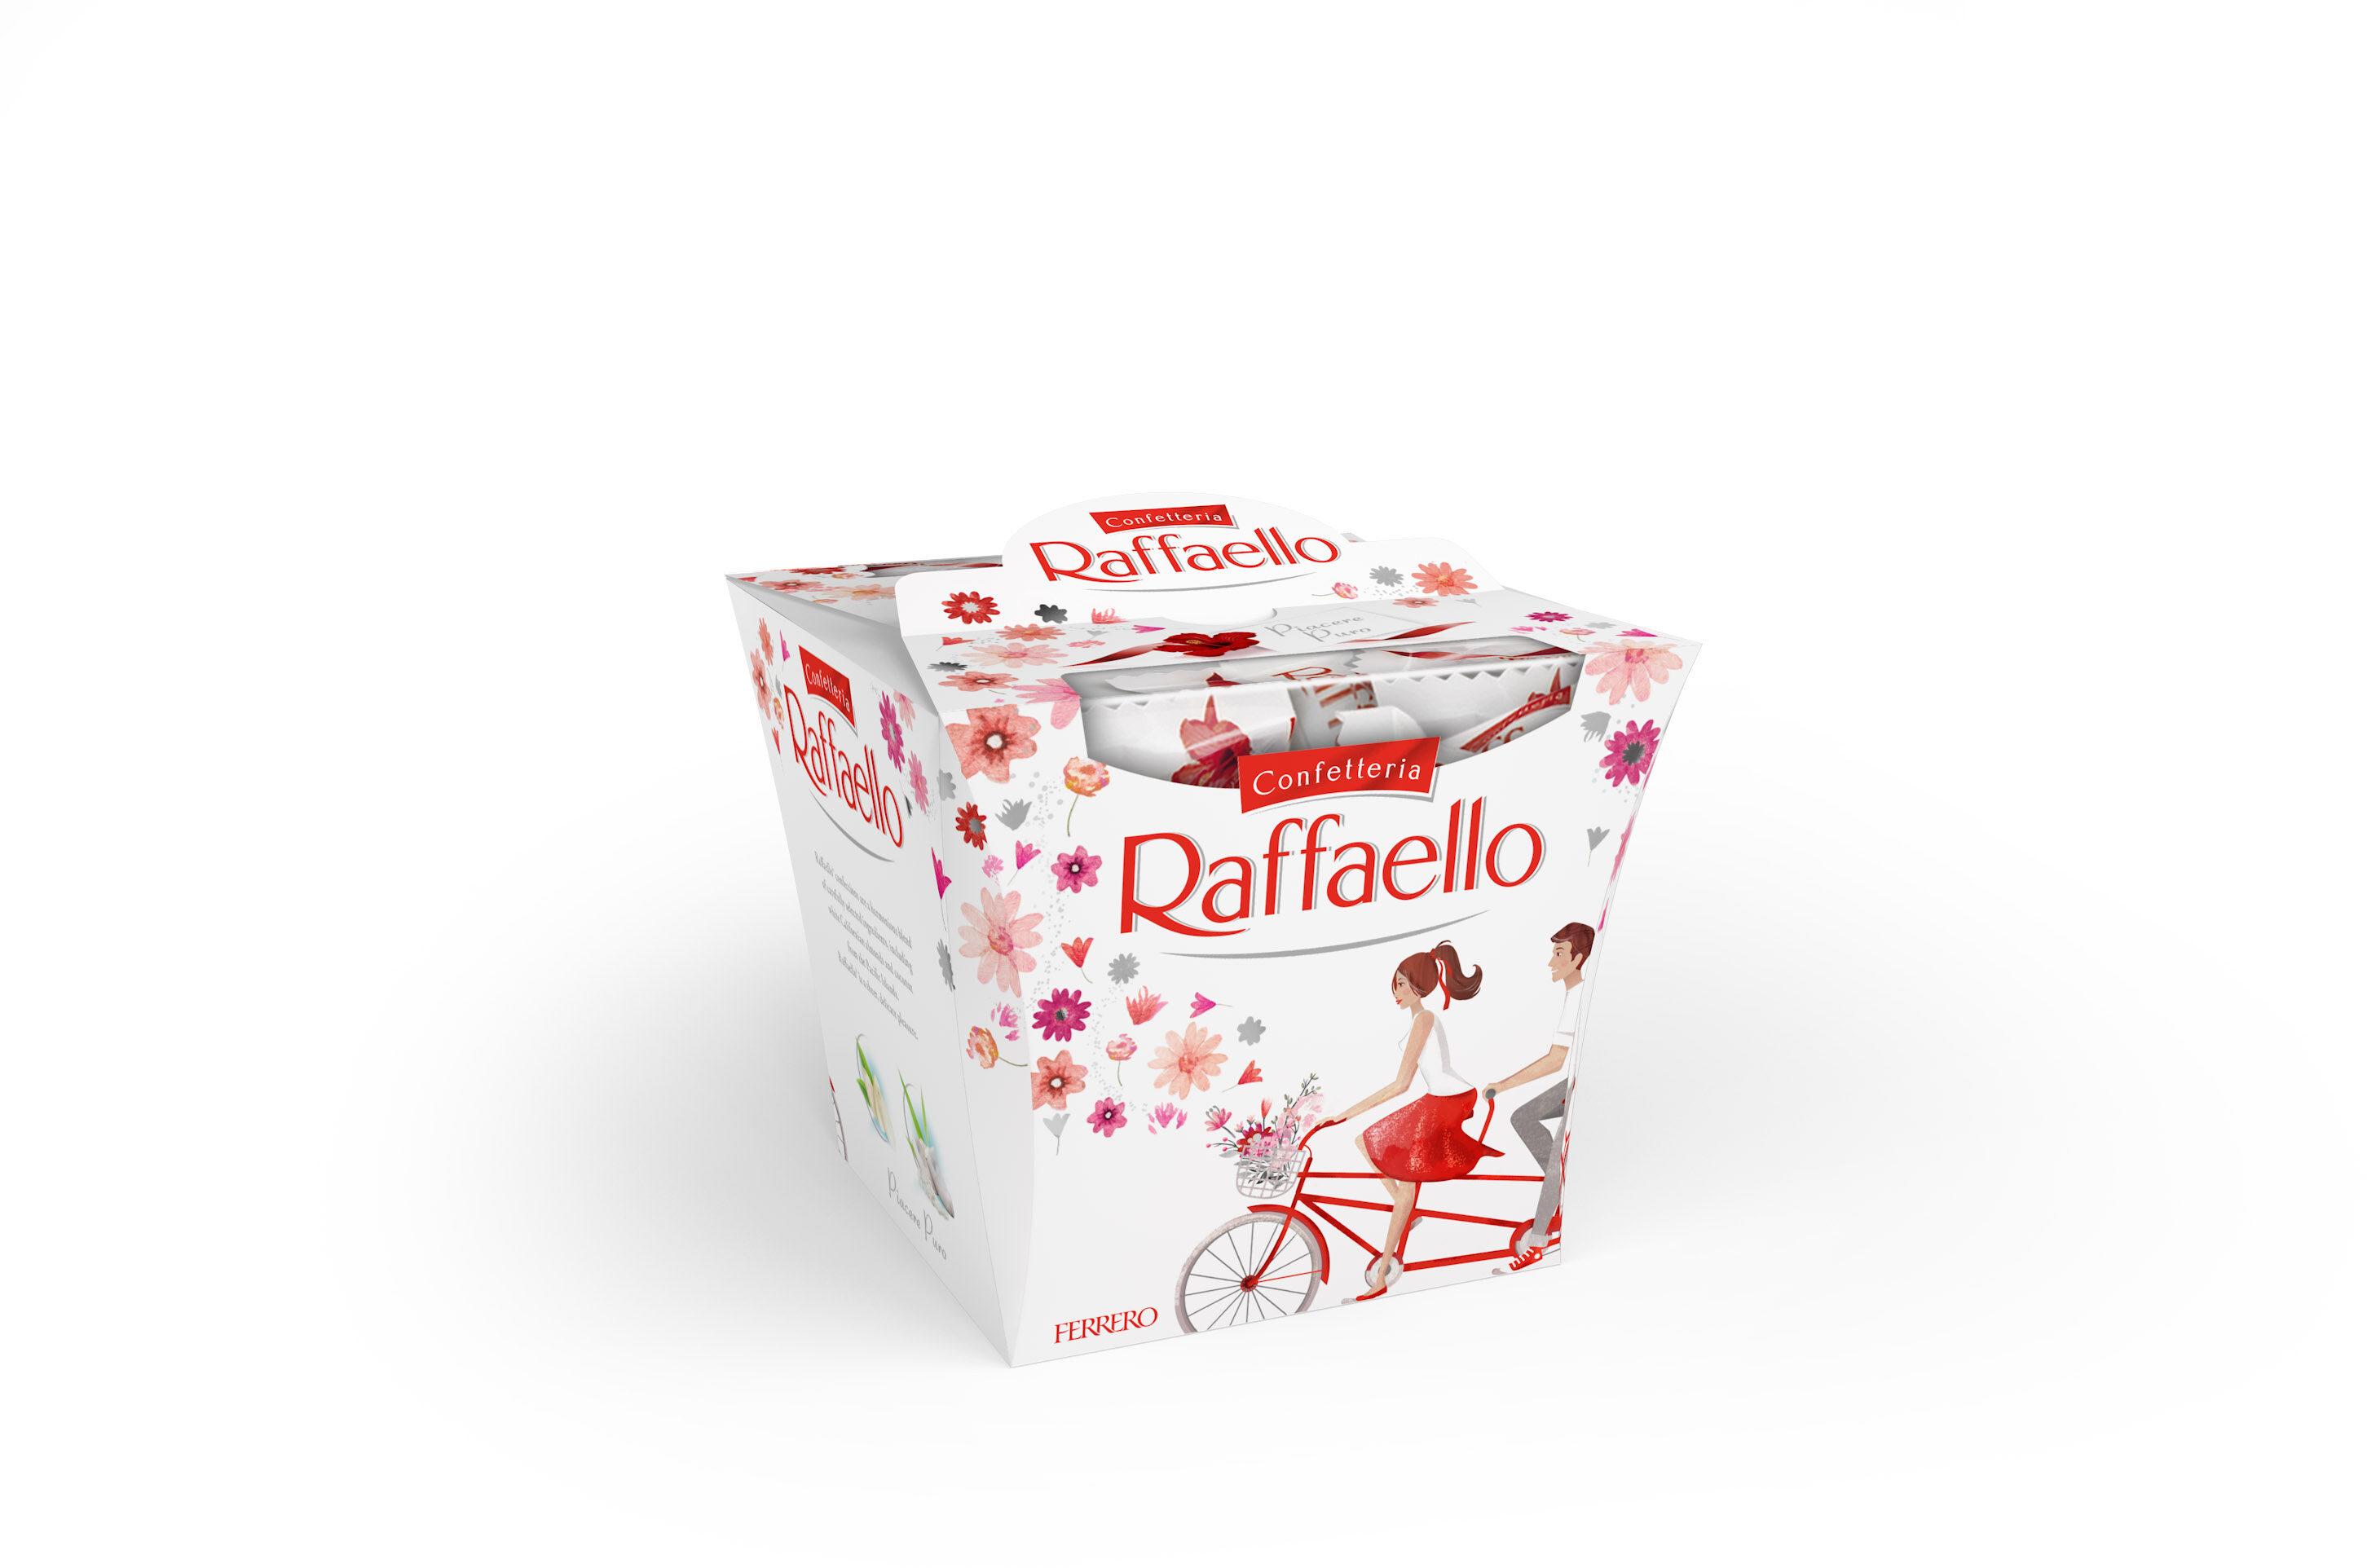 Raffaello fines gaufrettes enrobees de noix de coco fourrees noix de coco avec amande entiere ballotin de 18 pieces - Produit - fr